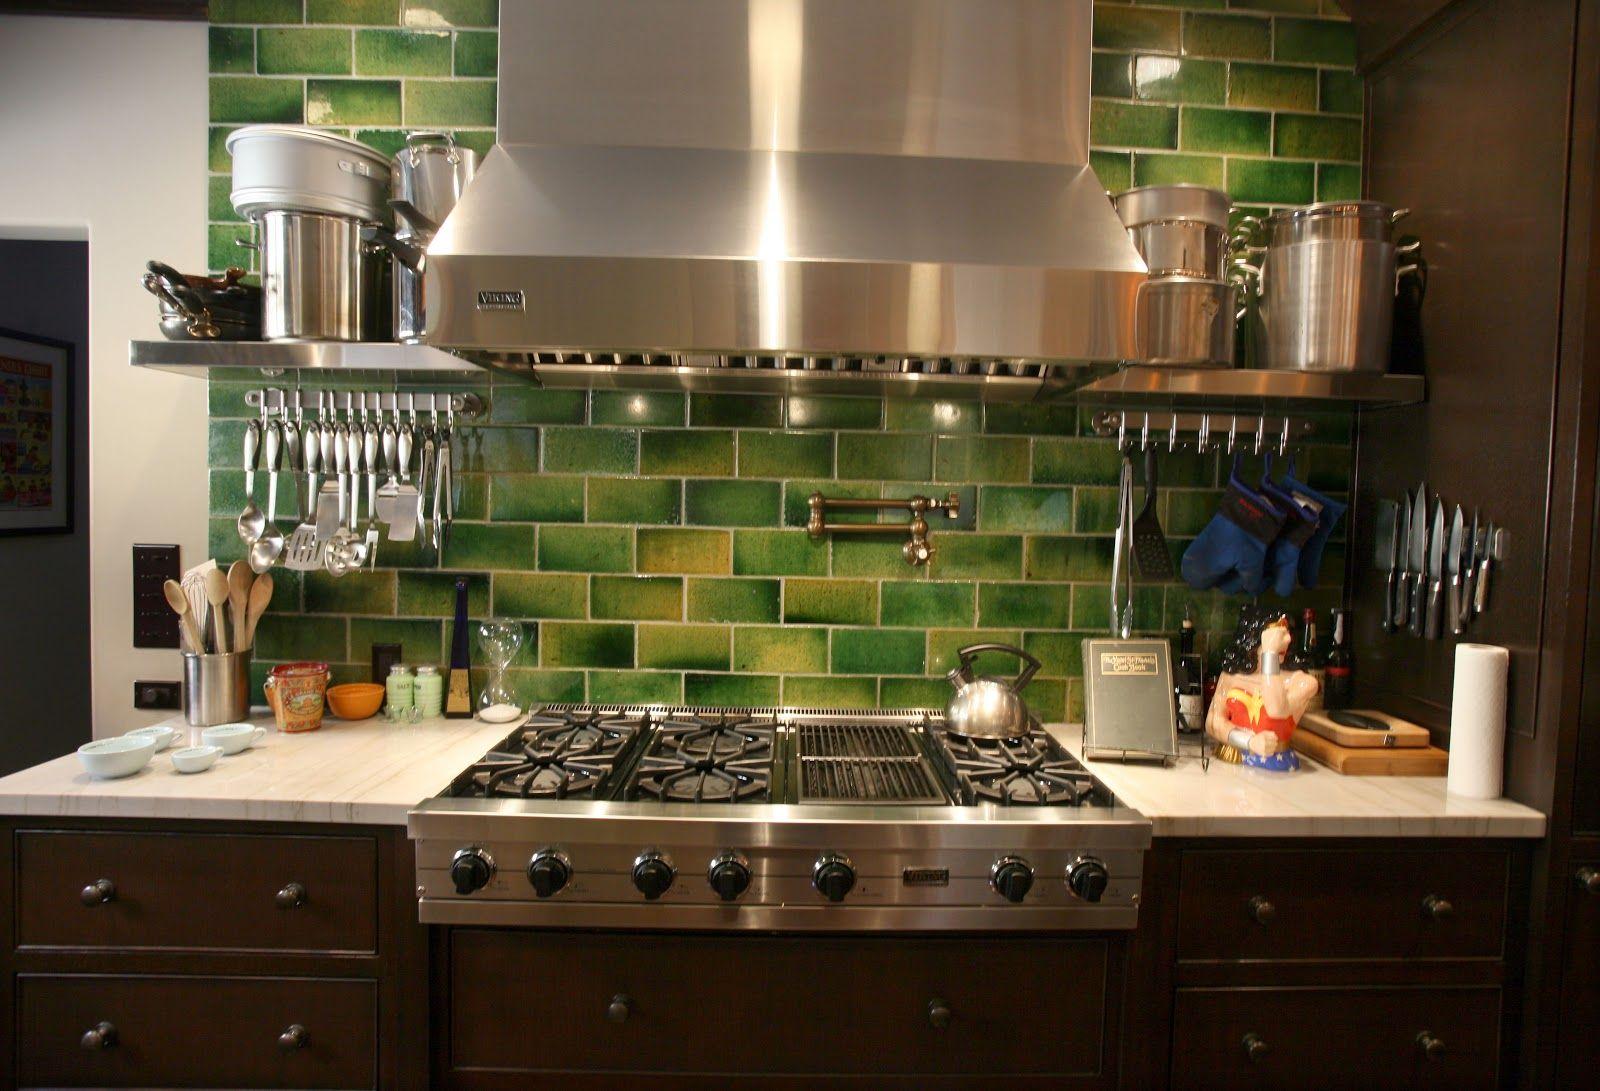 Green subway tile kitchen backsplash crafty dee faux glass tile green subway tile kitchen backsplash crafty dee faux glass tile backsplash dailygadgetfo Image collections